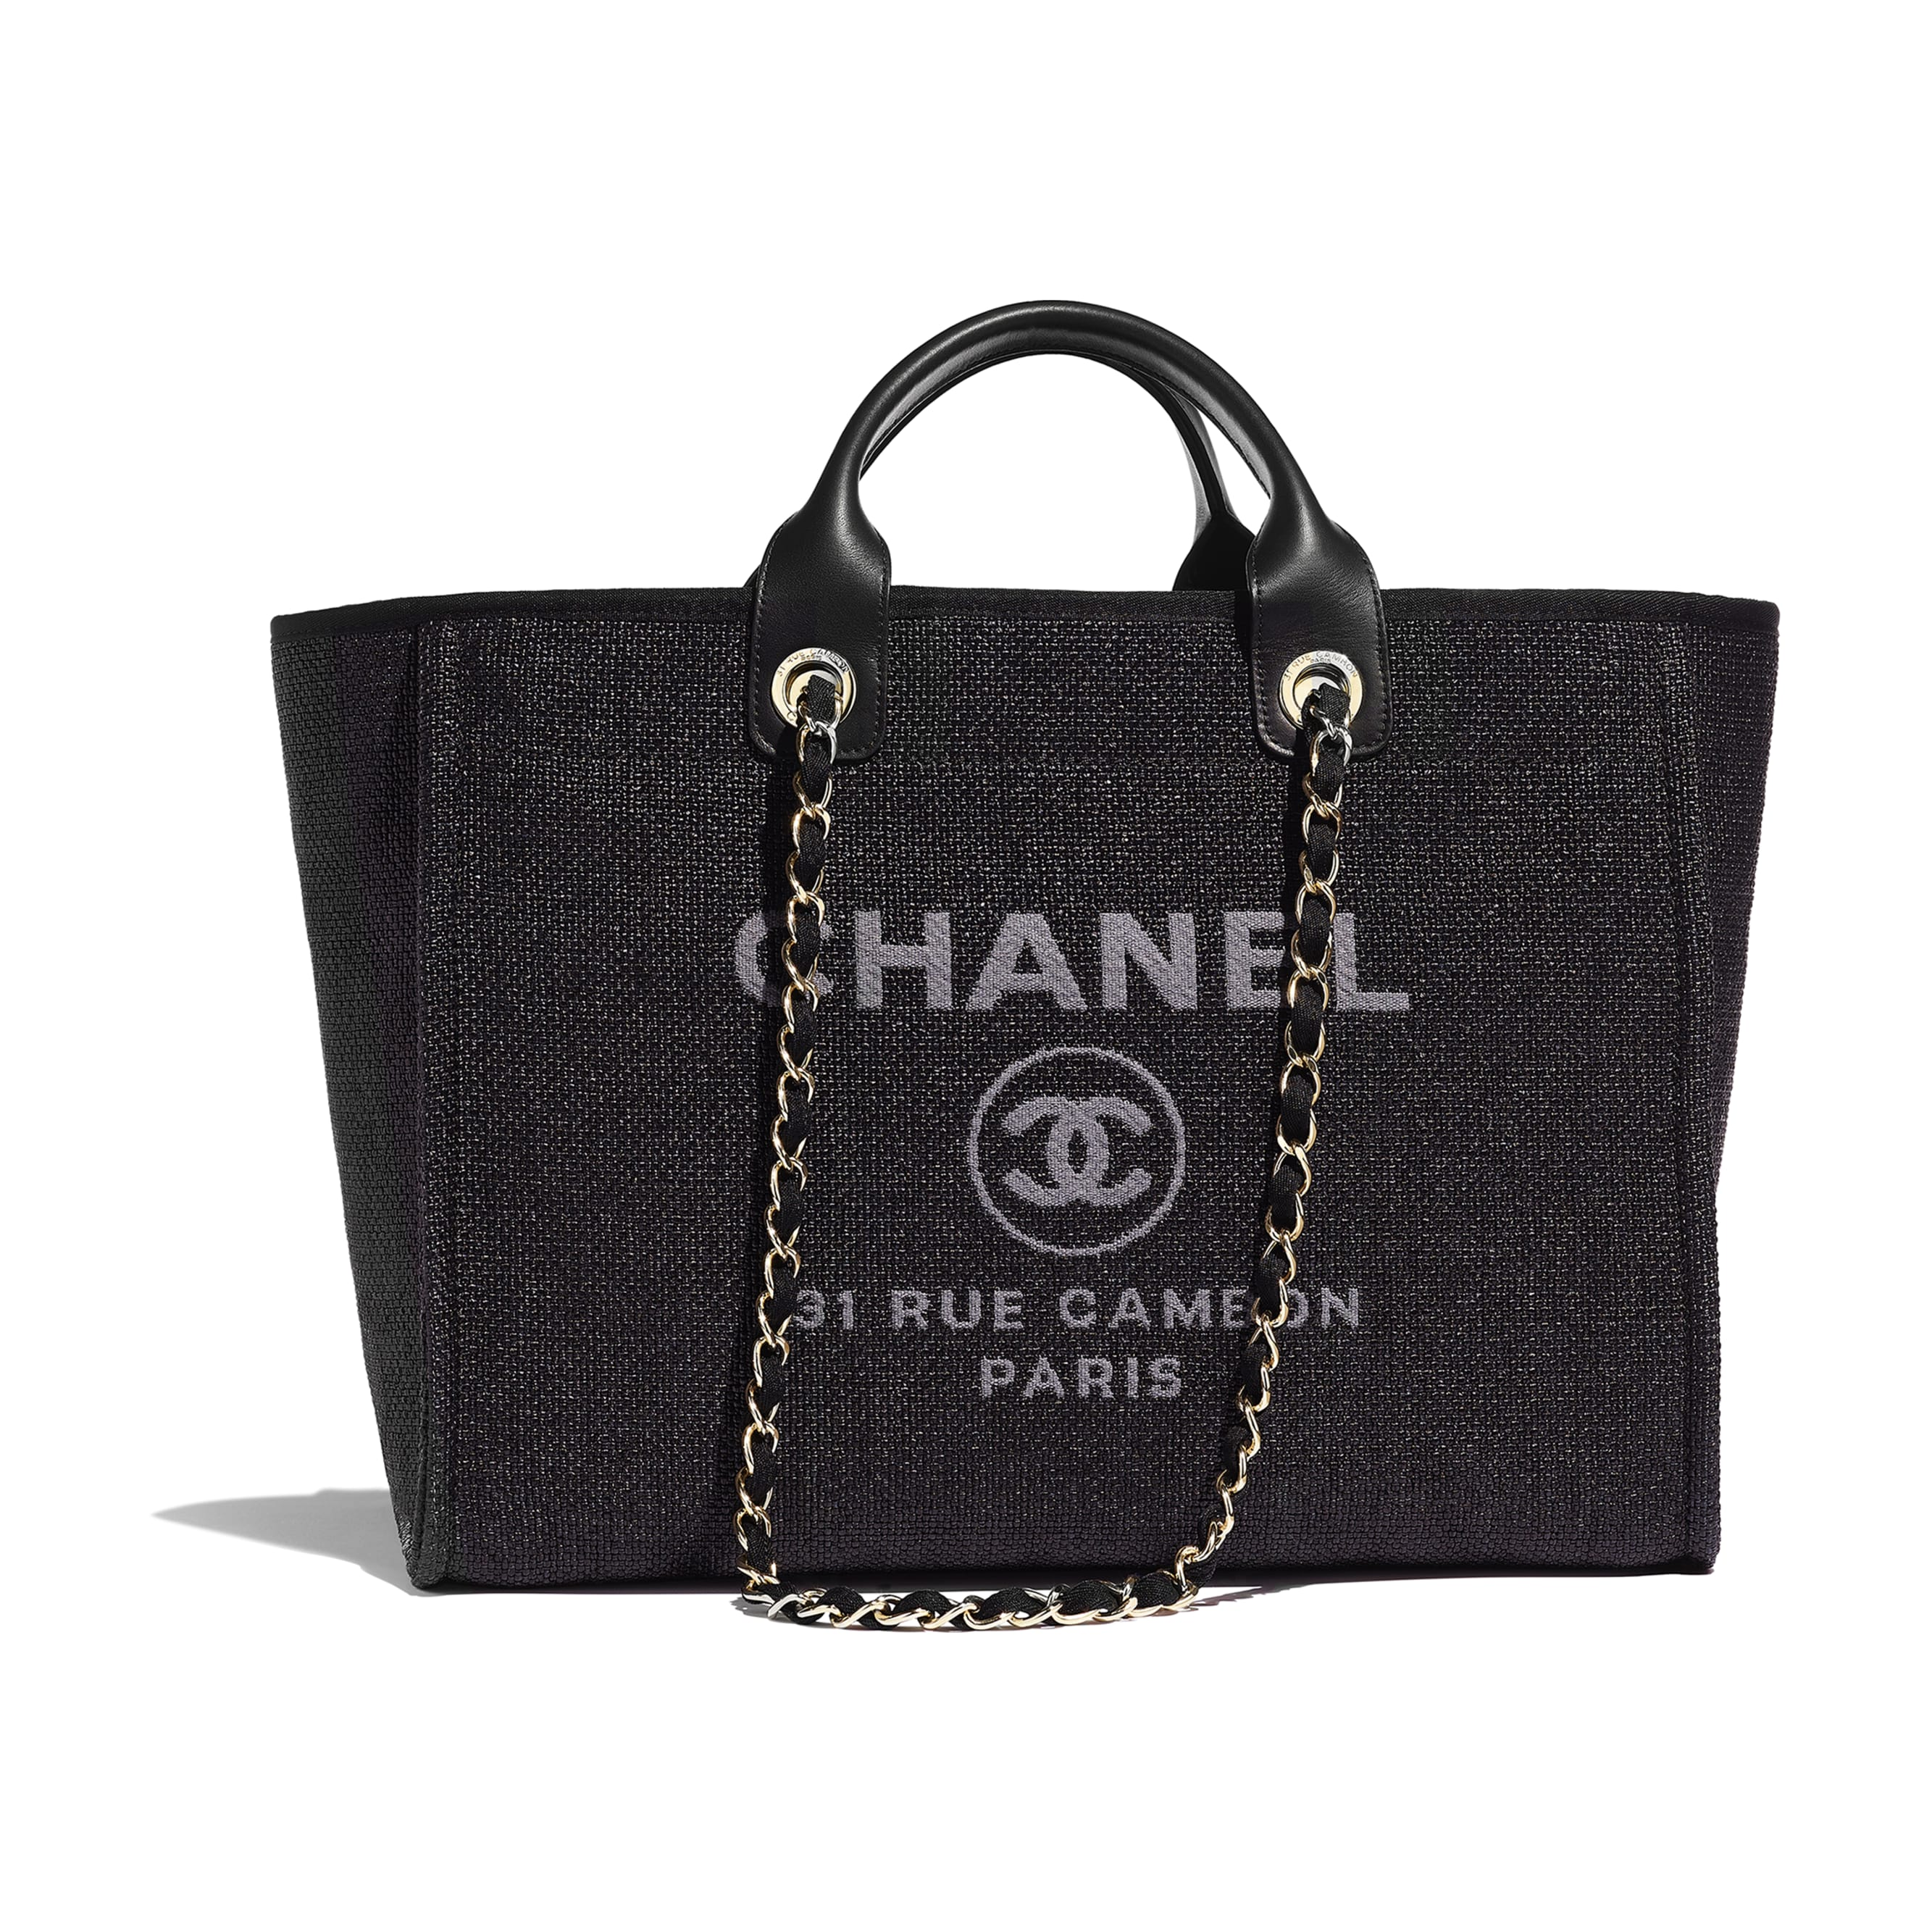 Shopping Bag - Black - Cotton, Nylon, Calfskin & Gold-Tone Metal - Default view - see standard sized version